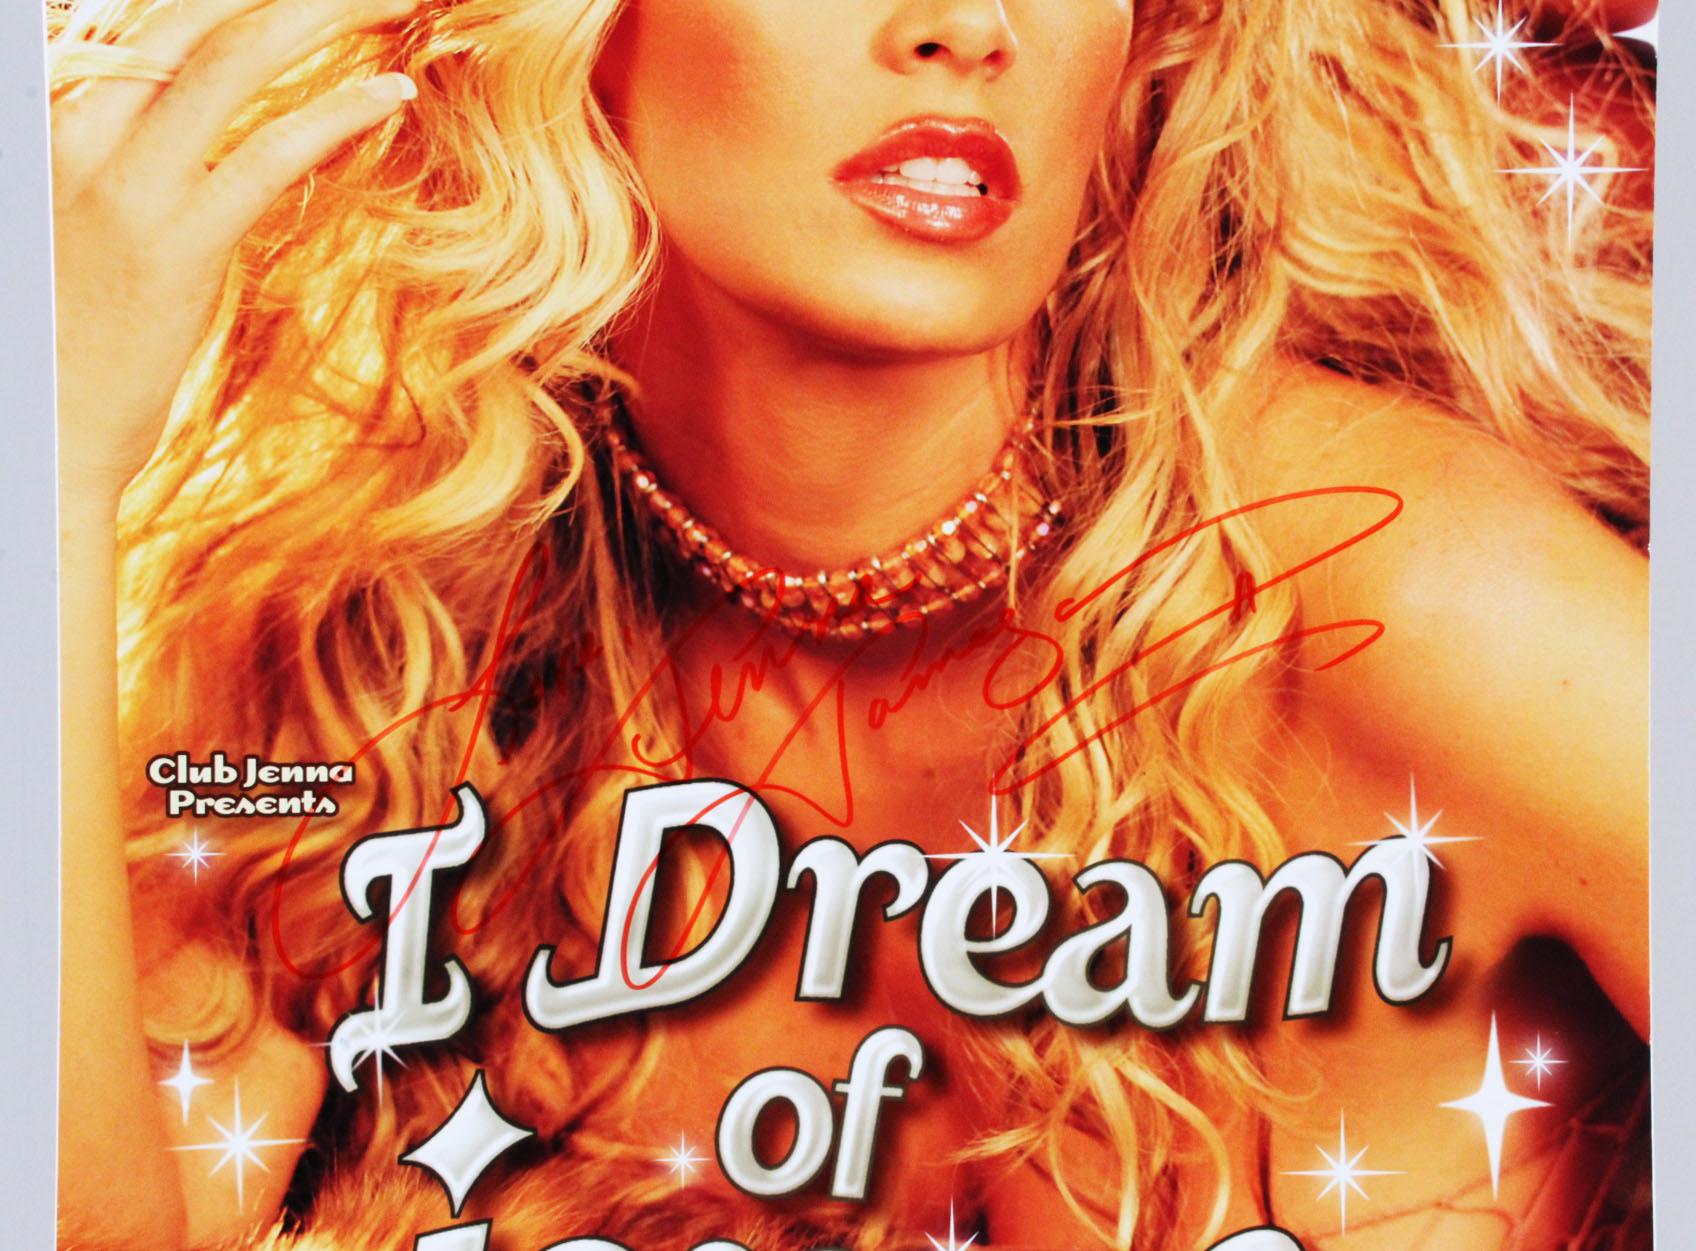 Jenna Jameson Signed Poster I Dream of Jenna - COA JSA